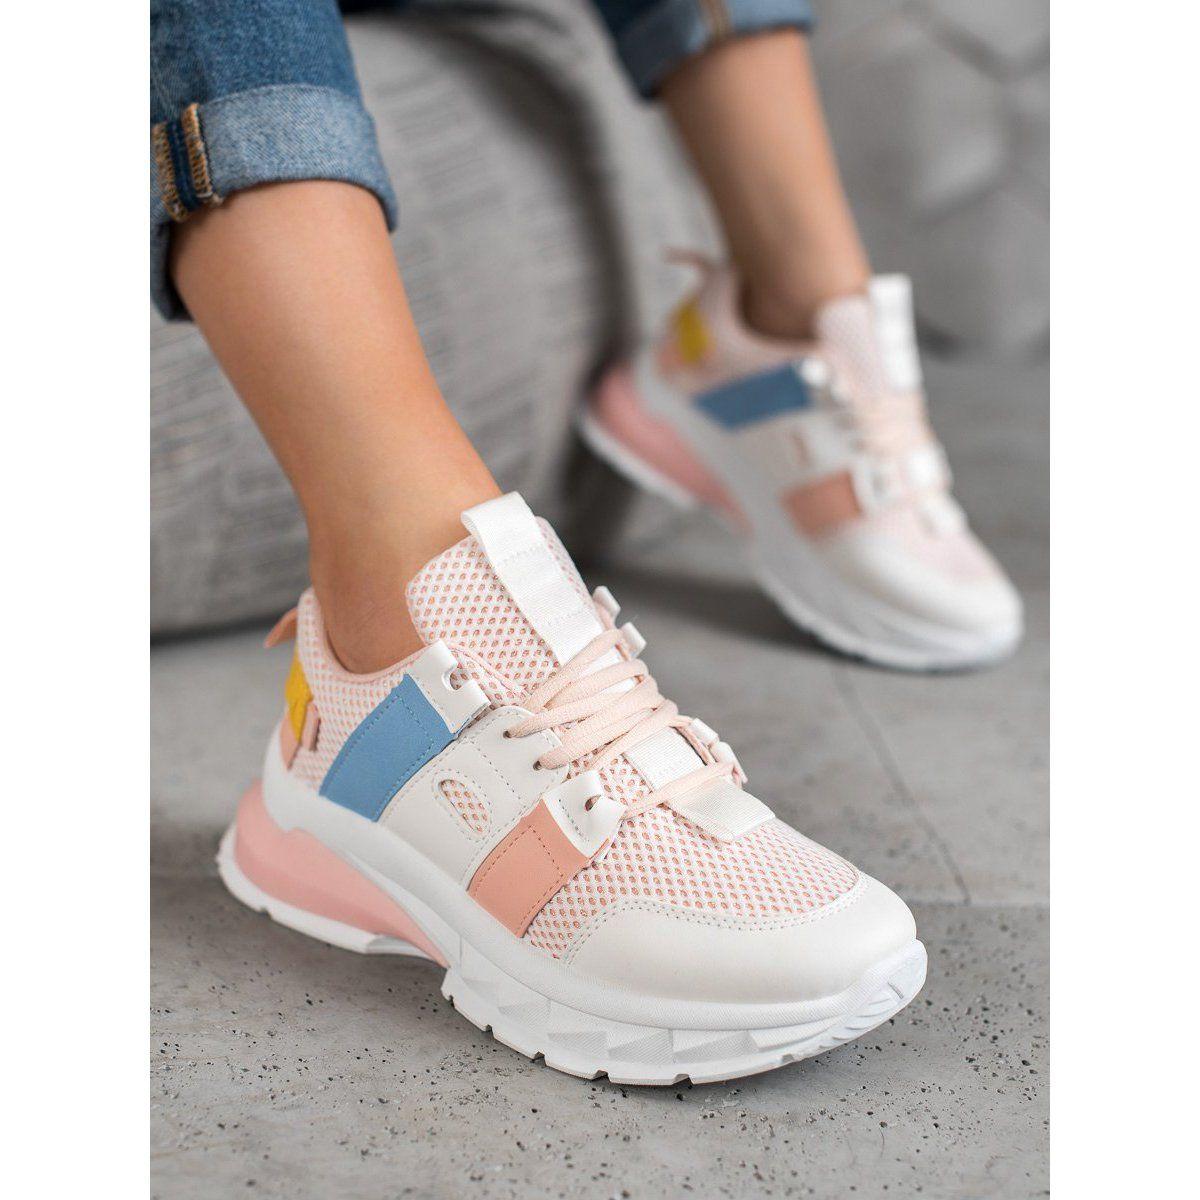 Seastar Kolorowe Sneakersy Z Siateczka Biale Wielokolorowe Sneakers Nike Sneakers Nike